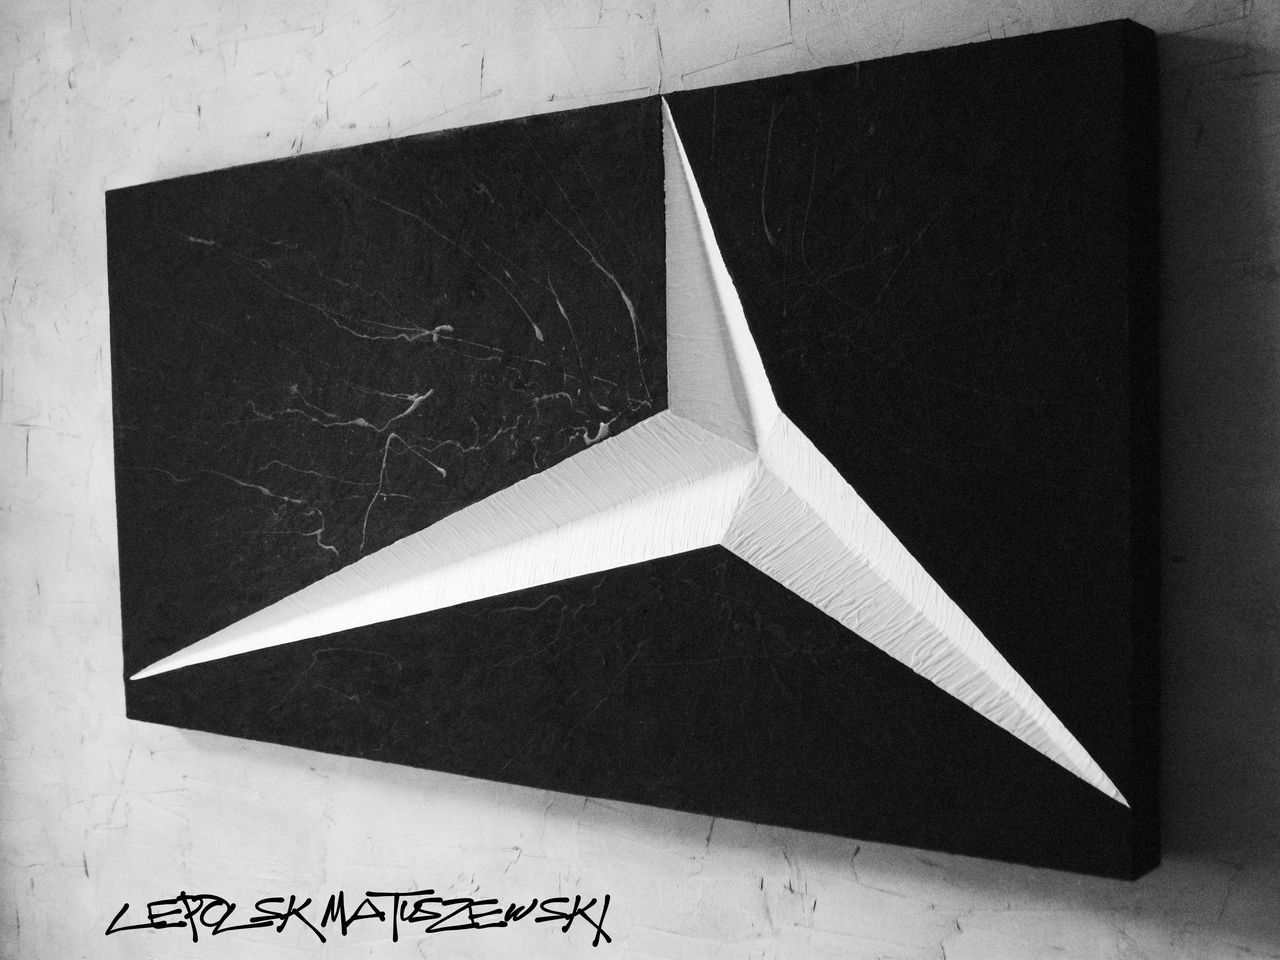 LEPOLSK MATUSZEWSKI PROTOTYPE 115 expressionnisme abstrait